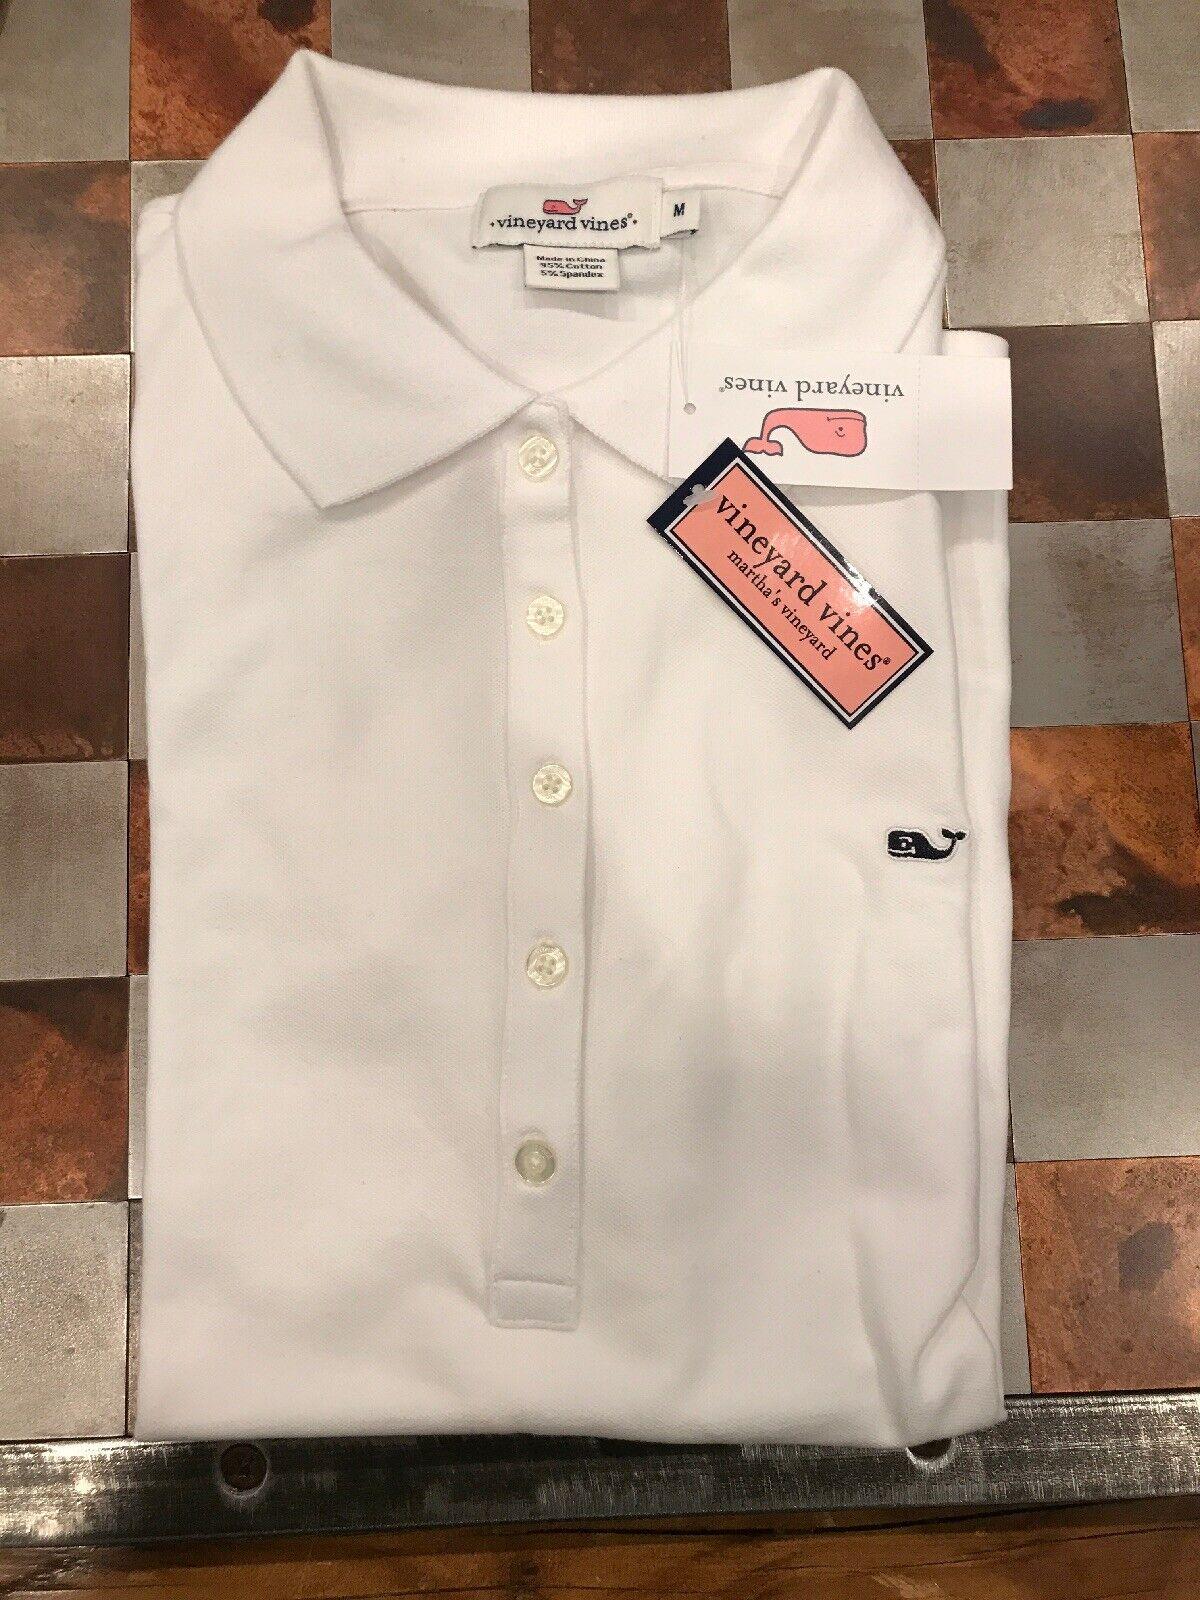 damen's Vineyard Vines Weiß Polo Shirt - Medium NWT